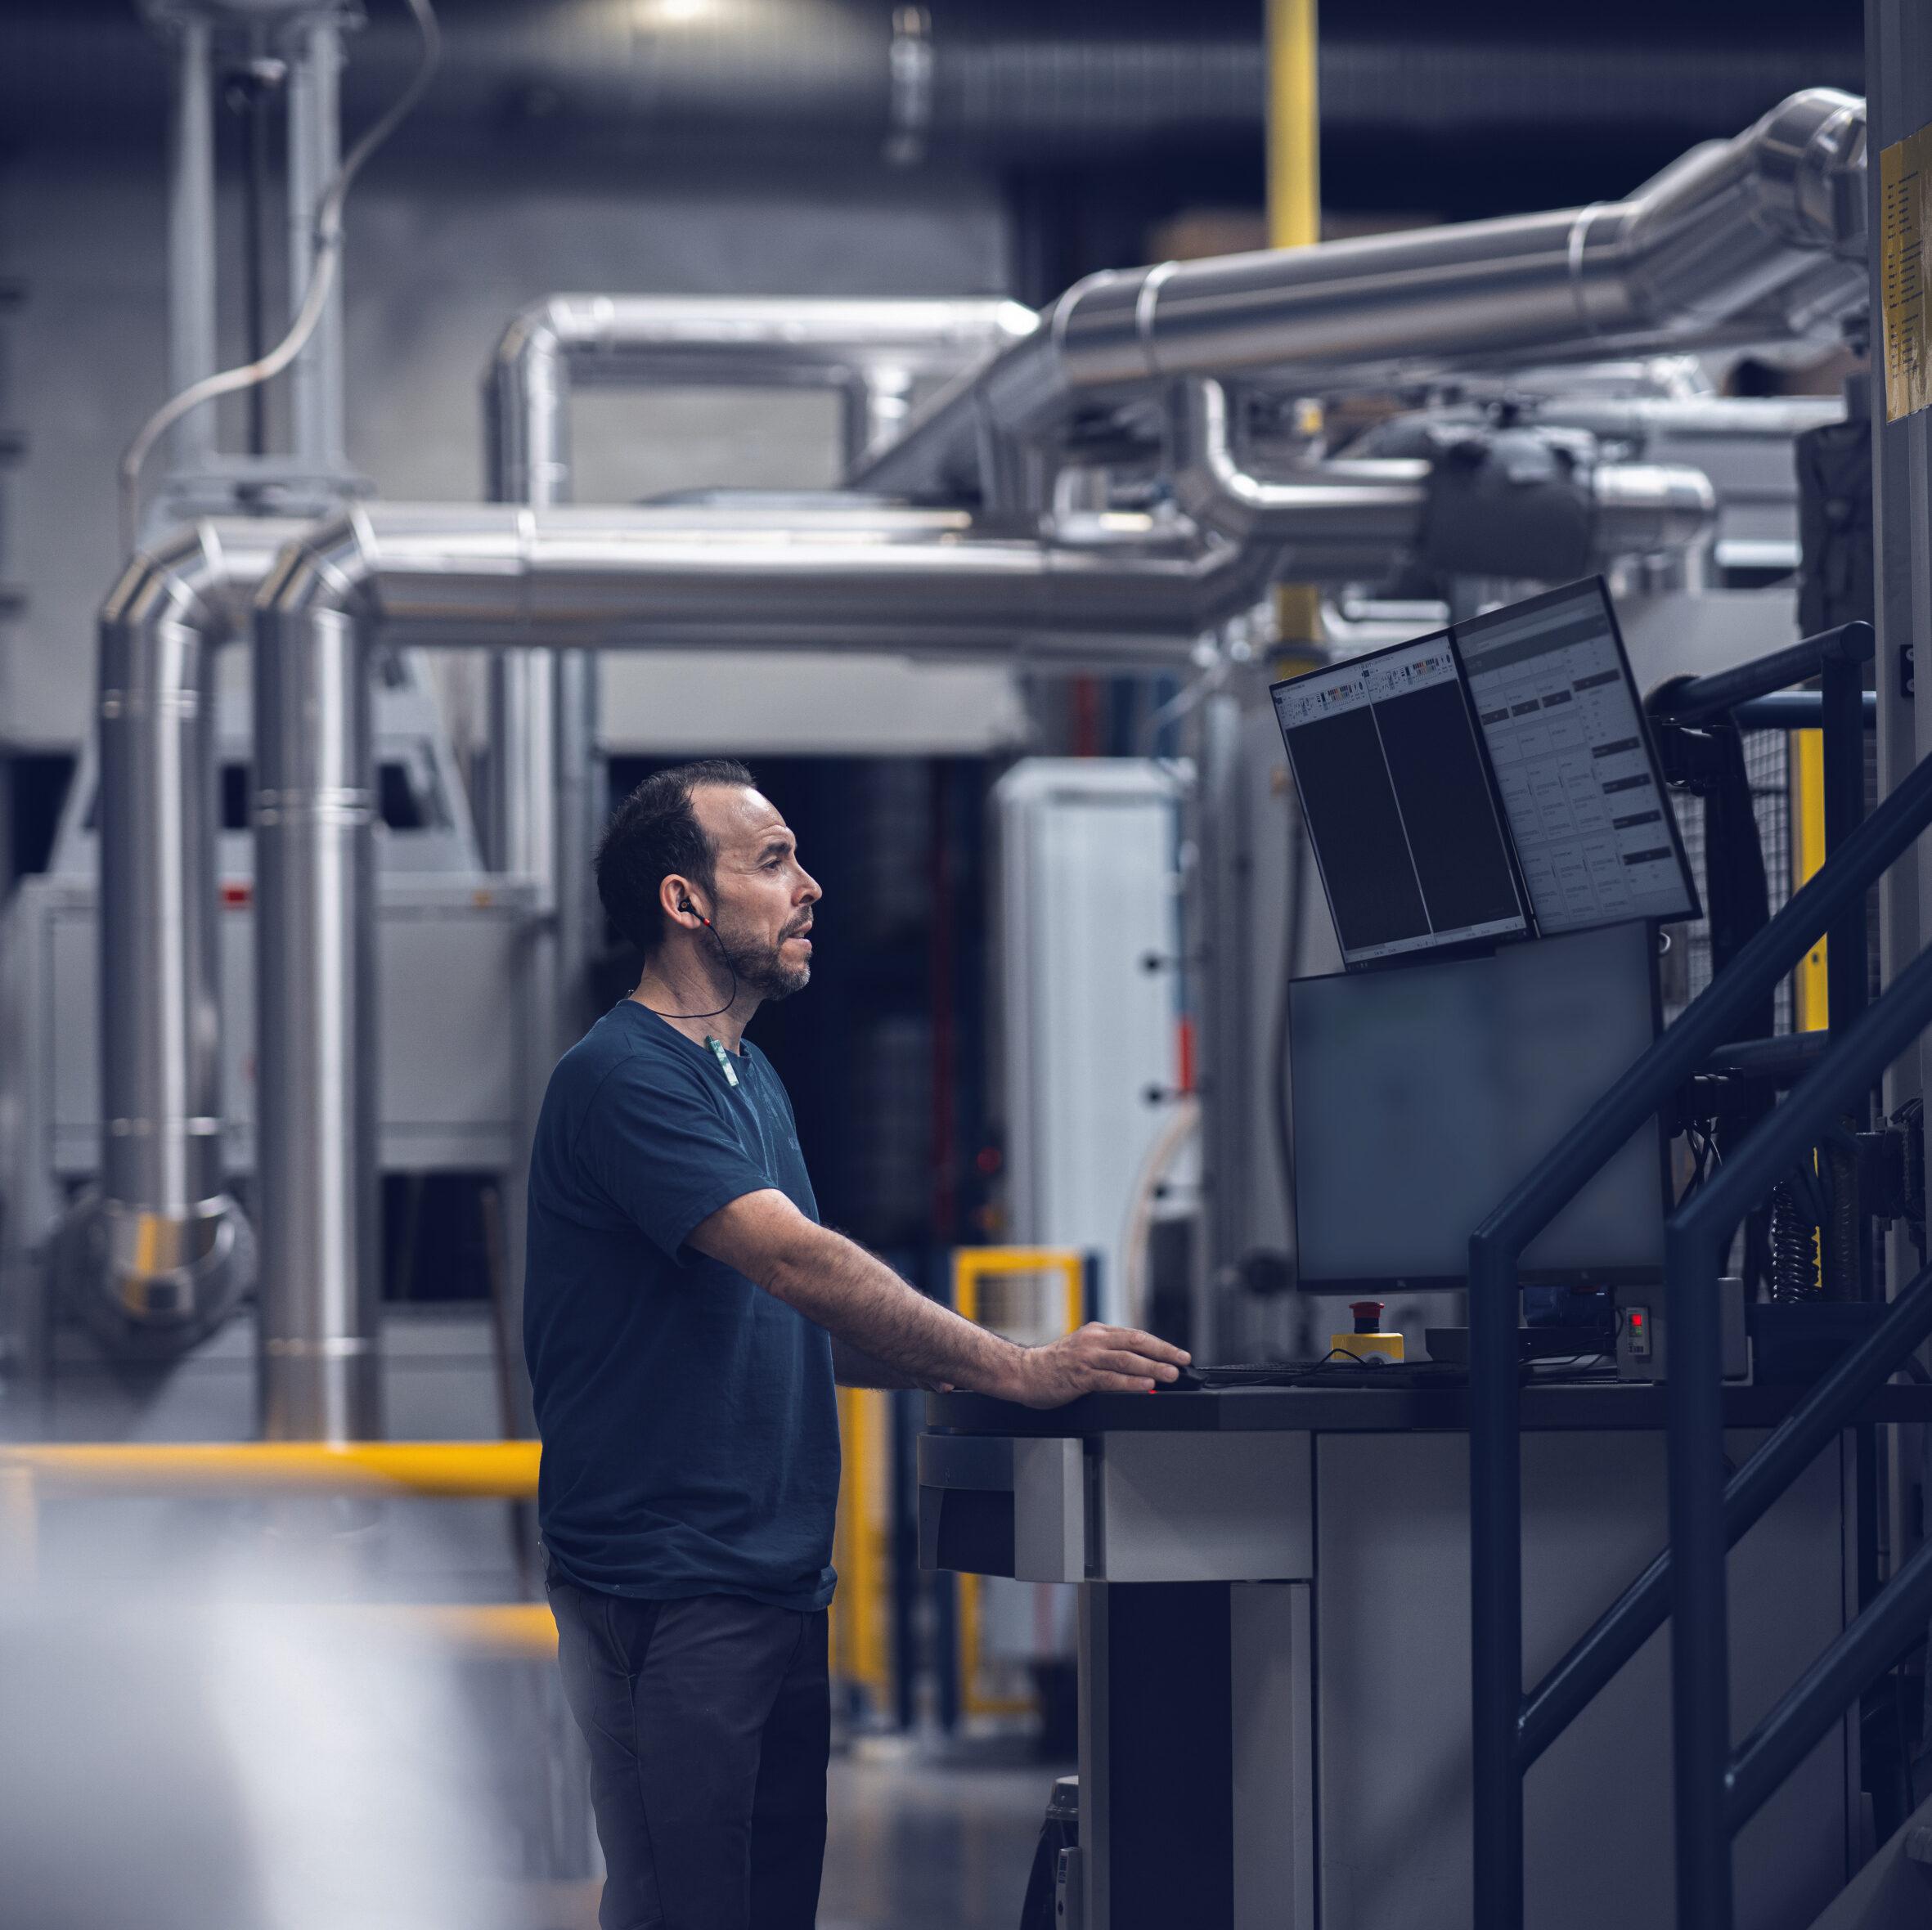 Automated quality control using Robovision AI